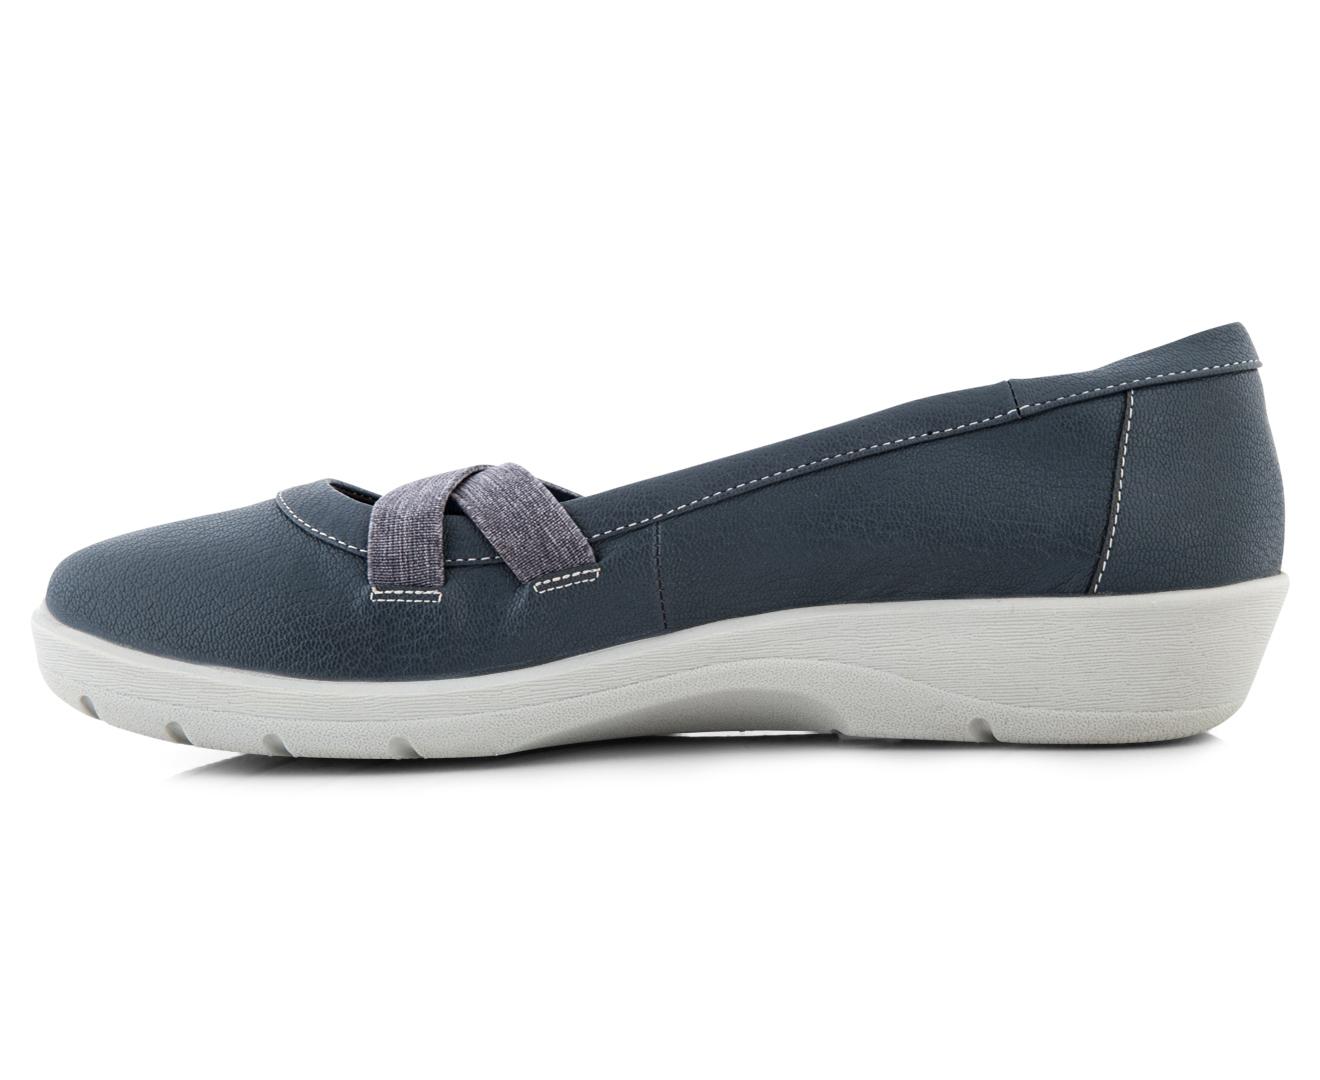 Fashionable Orthopaiedic Shoes Australia